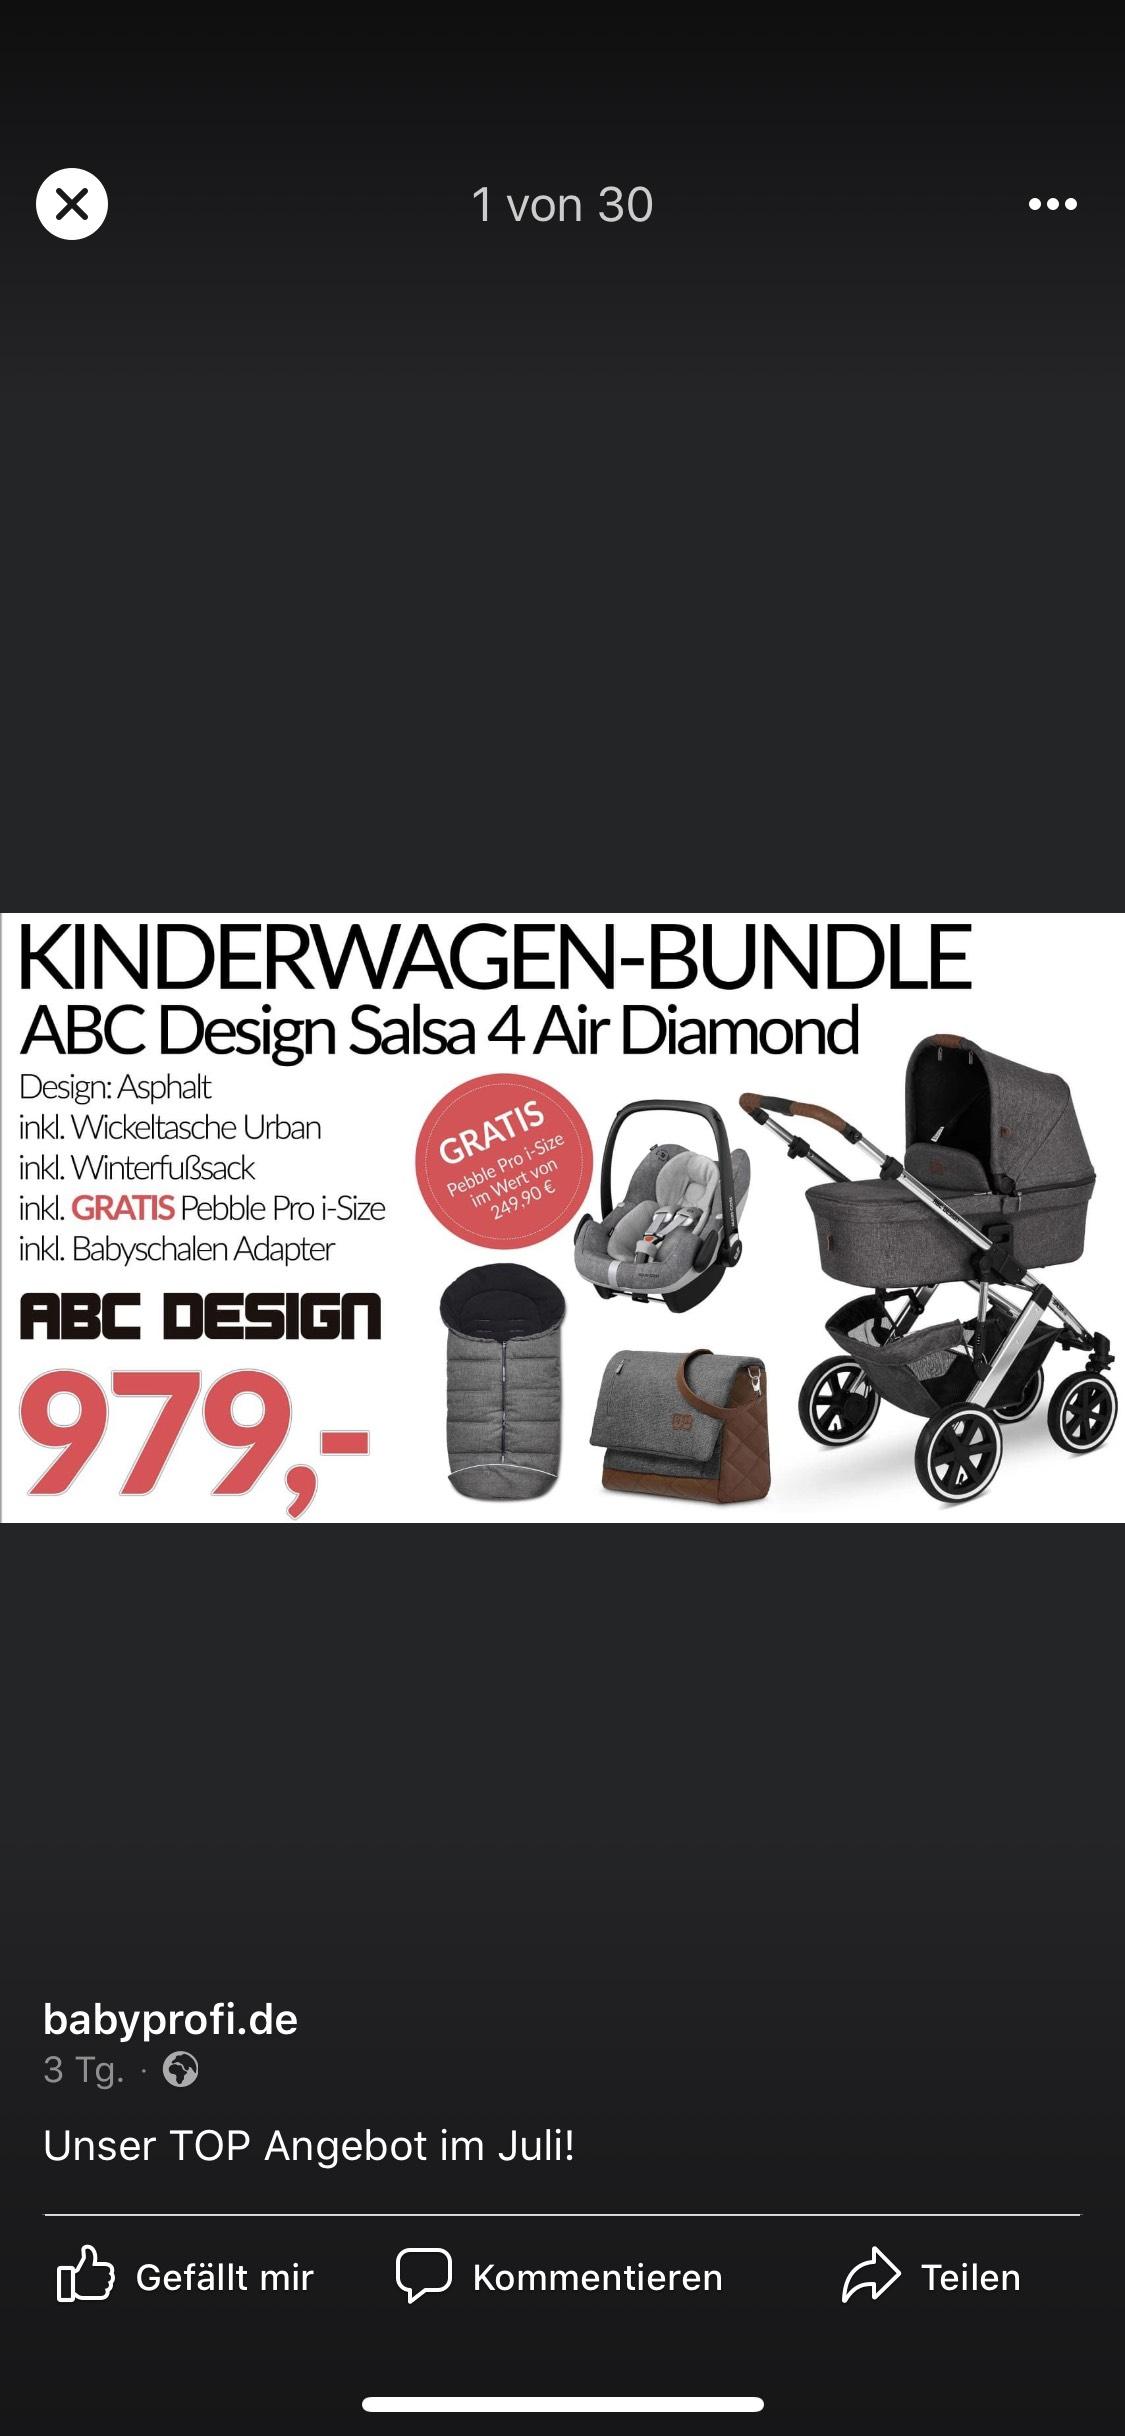 Lokal: ABC Design Salsa 4 Air Diamond Asphalt Kinderwagen mit Winterfußsack, Wickeltasche und Maxi Cosi Pebble Pro i size